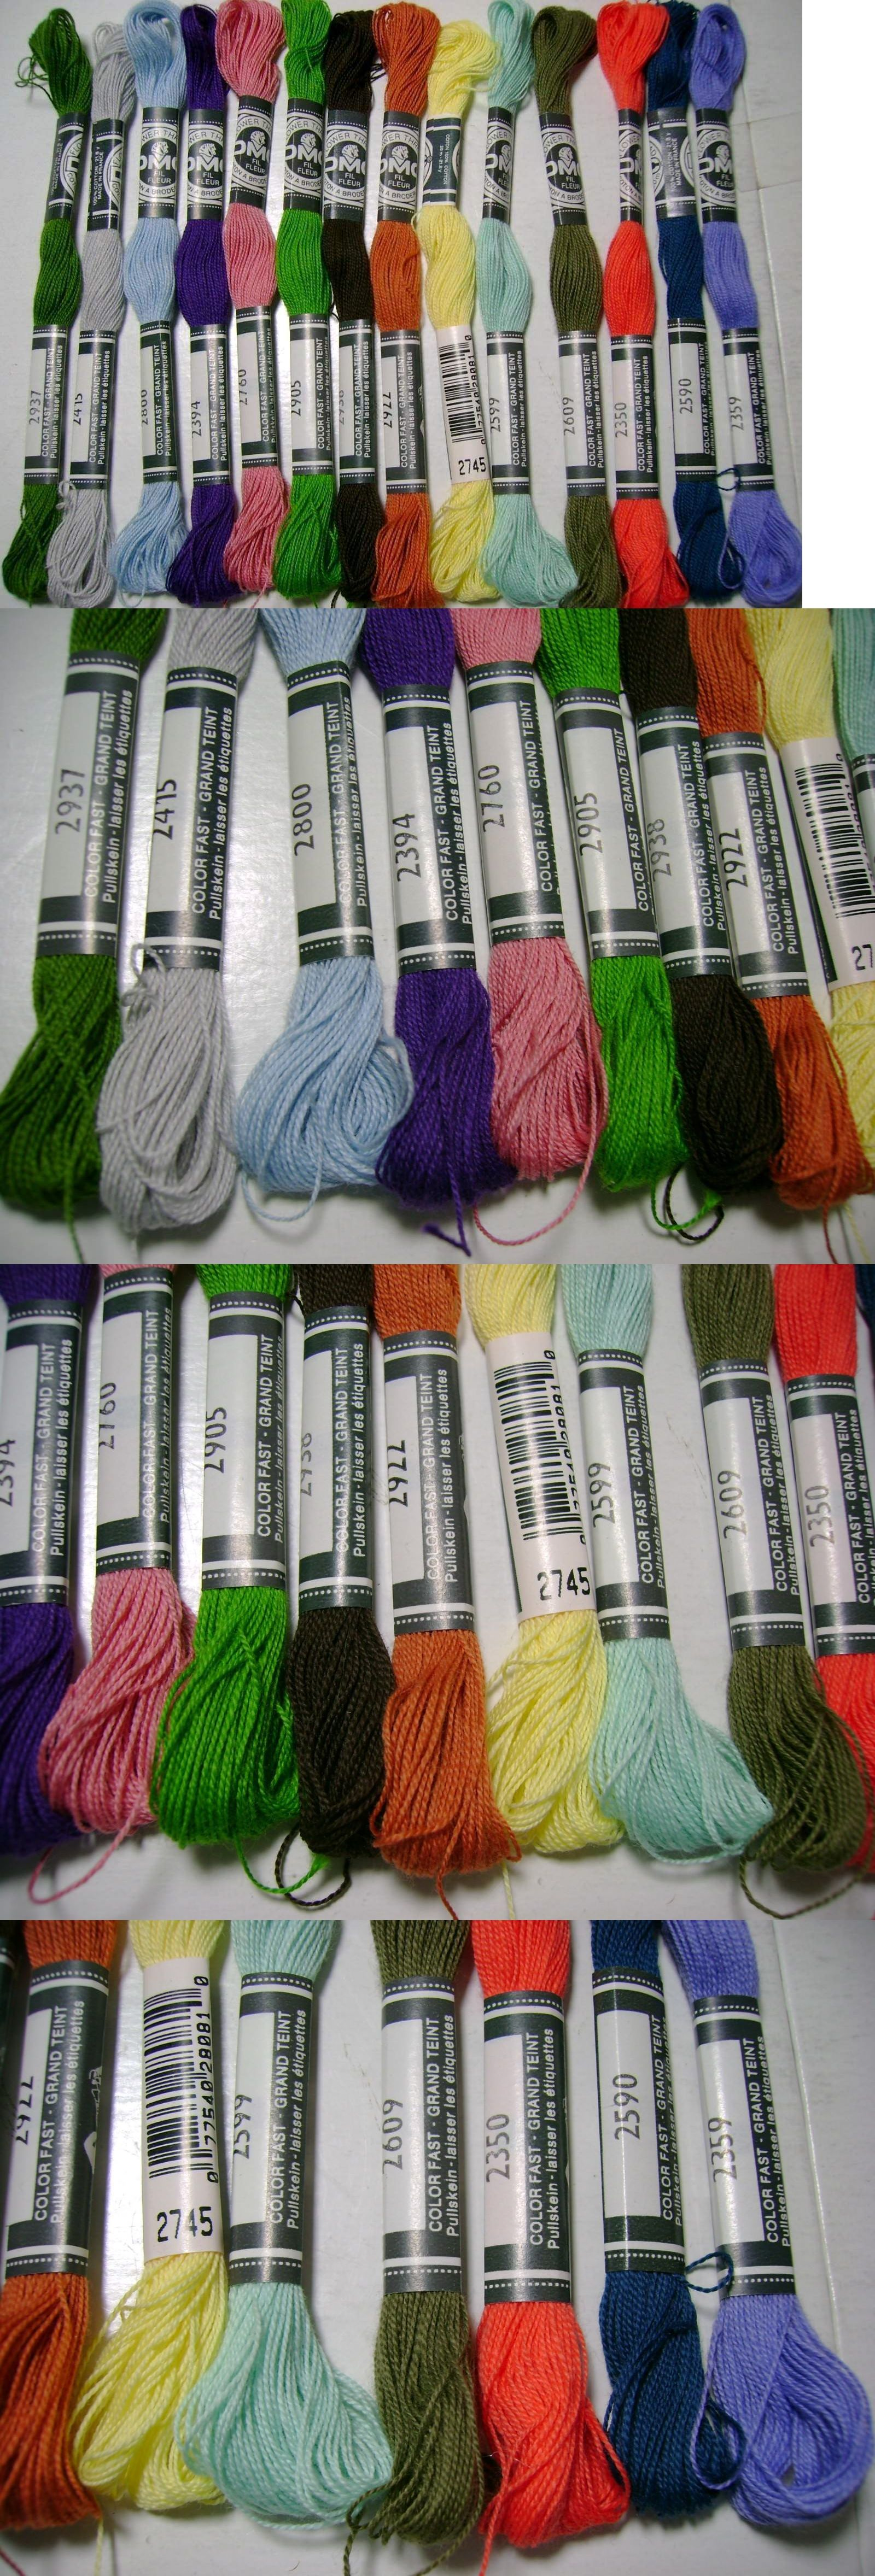 Hand Embroidery Floss And Thread 28144 14 Dmc Flower Thread Embroidery Floss 14 Colors Nos J Buy It Now On With Images Embroidery Floss Floss Hand Embroidery